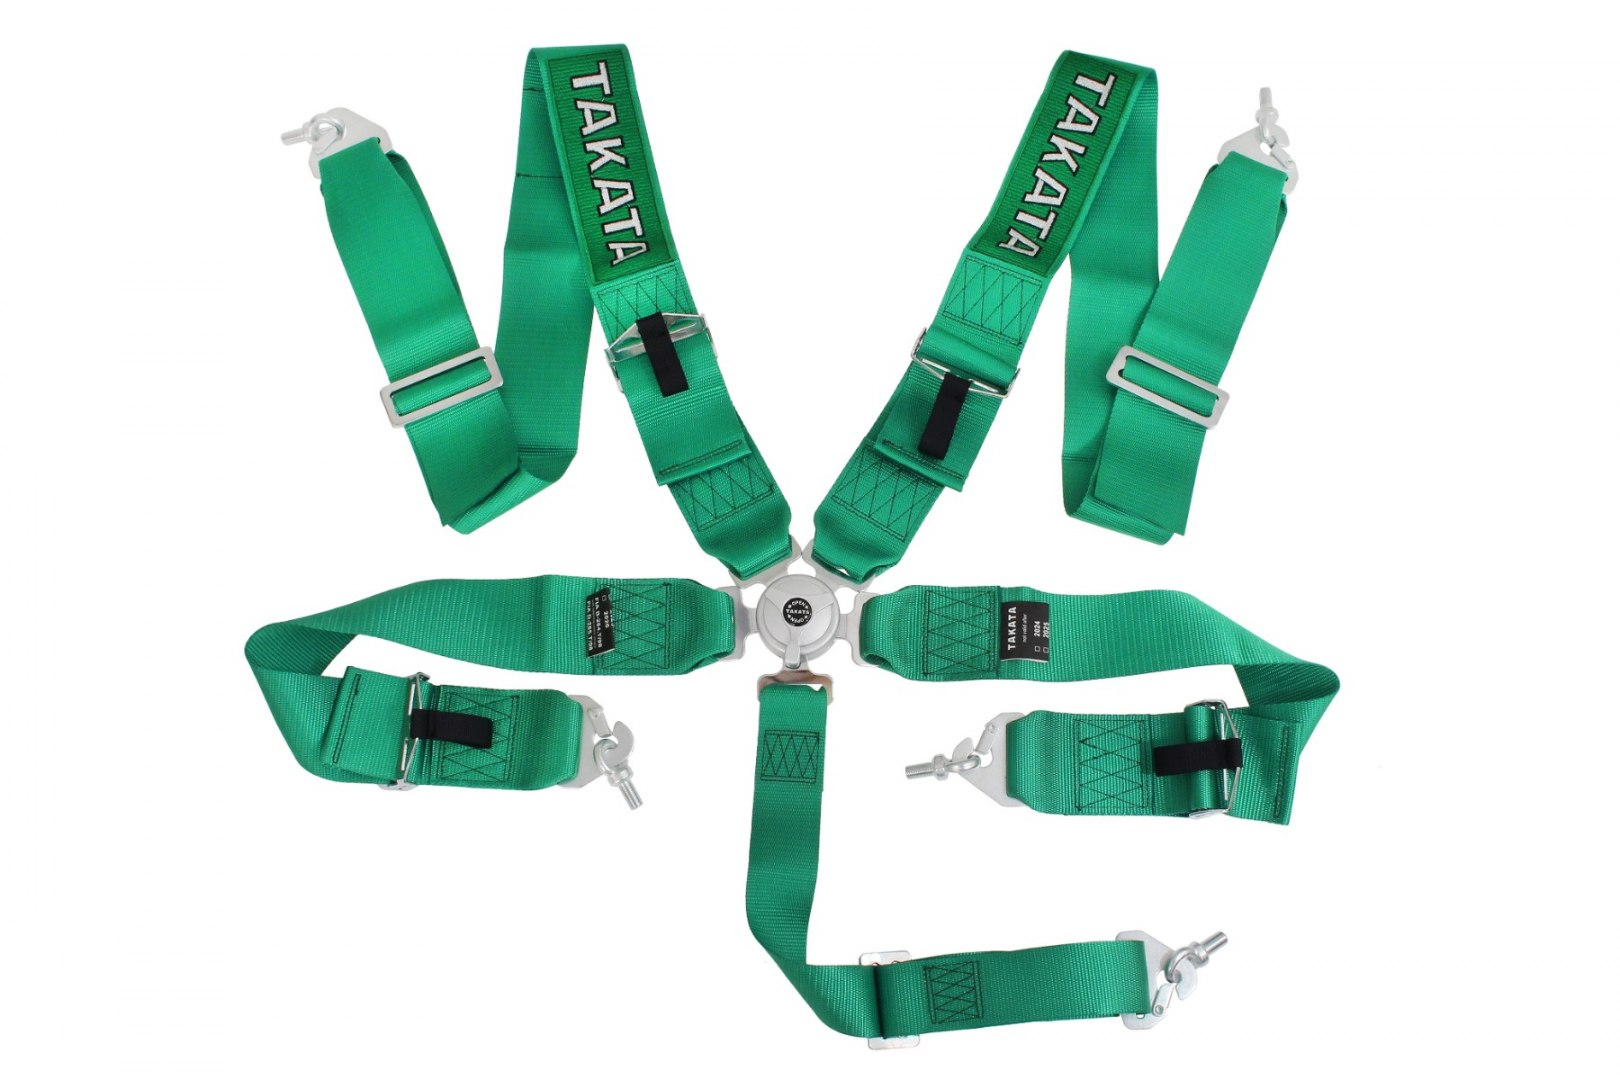 "Pasy sportowe 5p 3"" Green - Takata Replica harness - GRUBYGARAGE - Sklep Tuningowy"